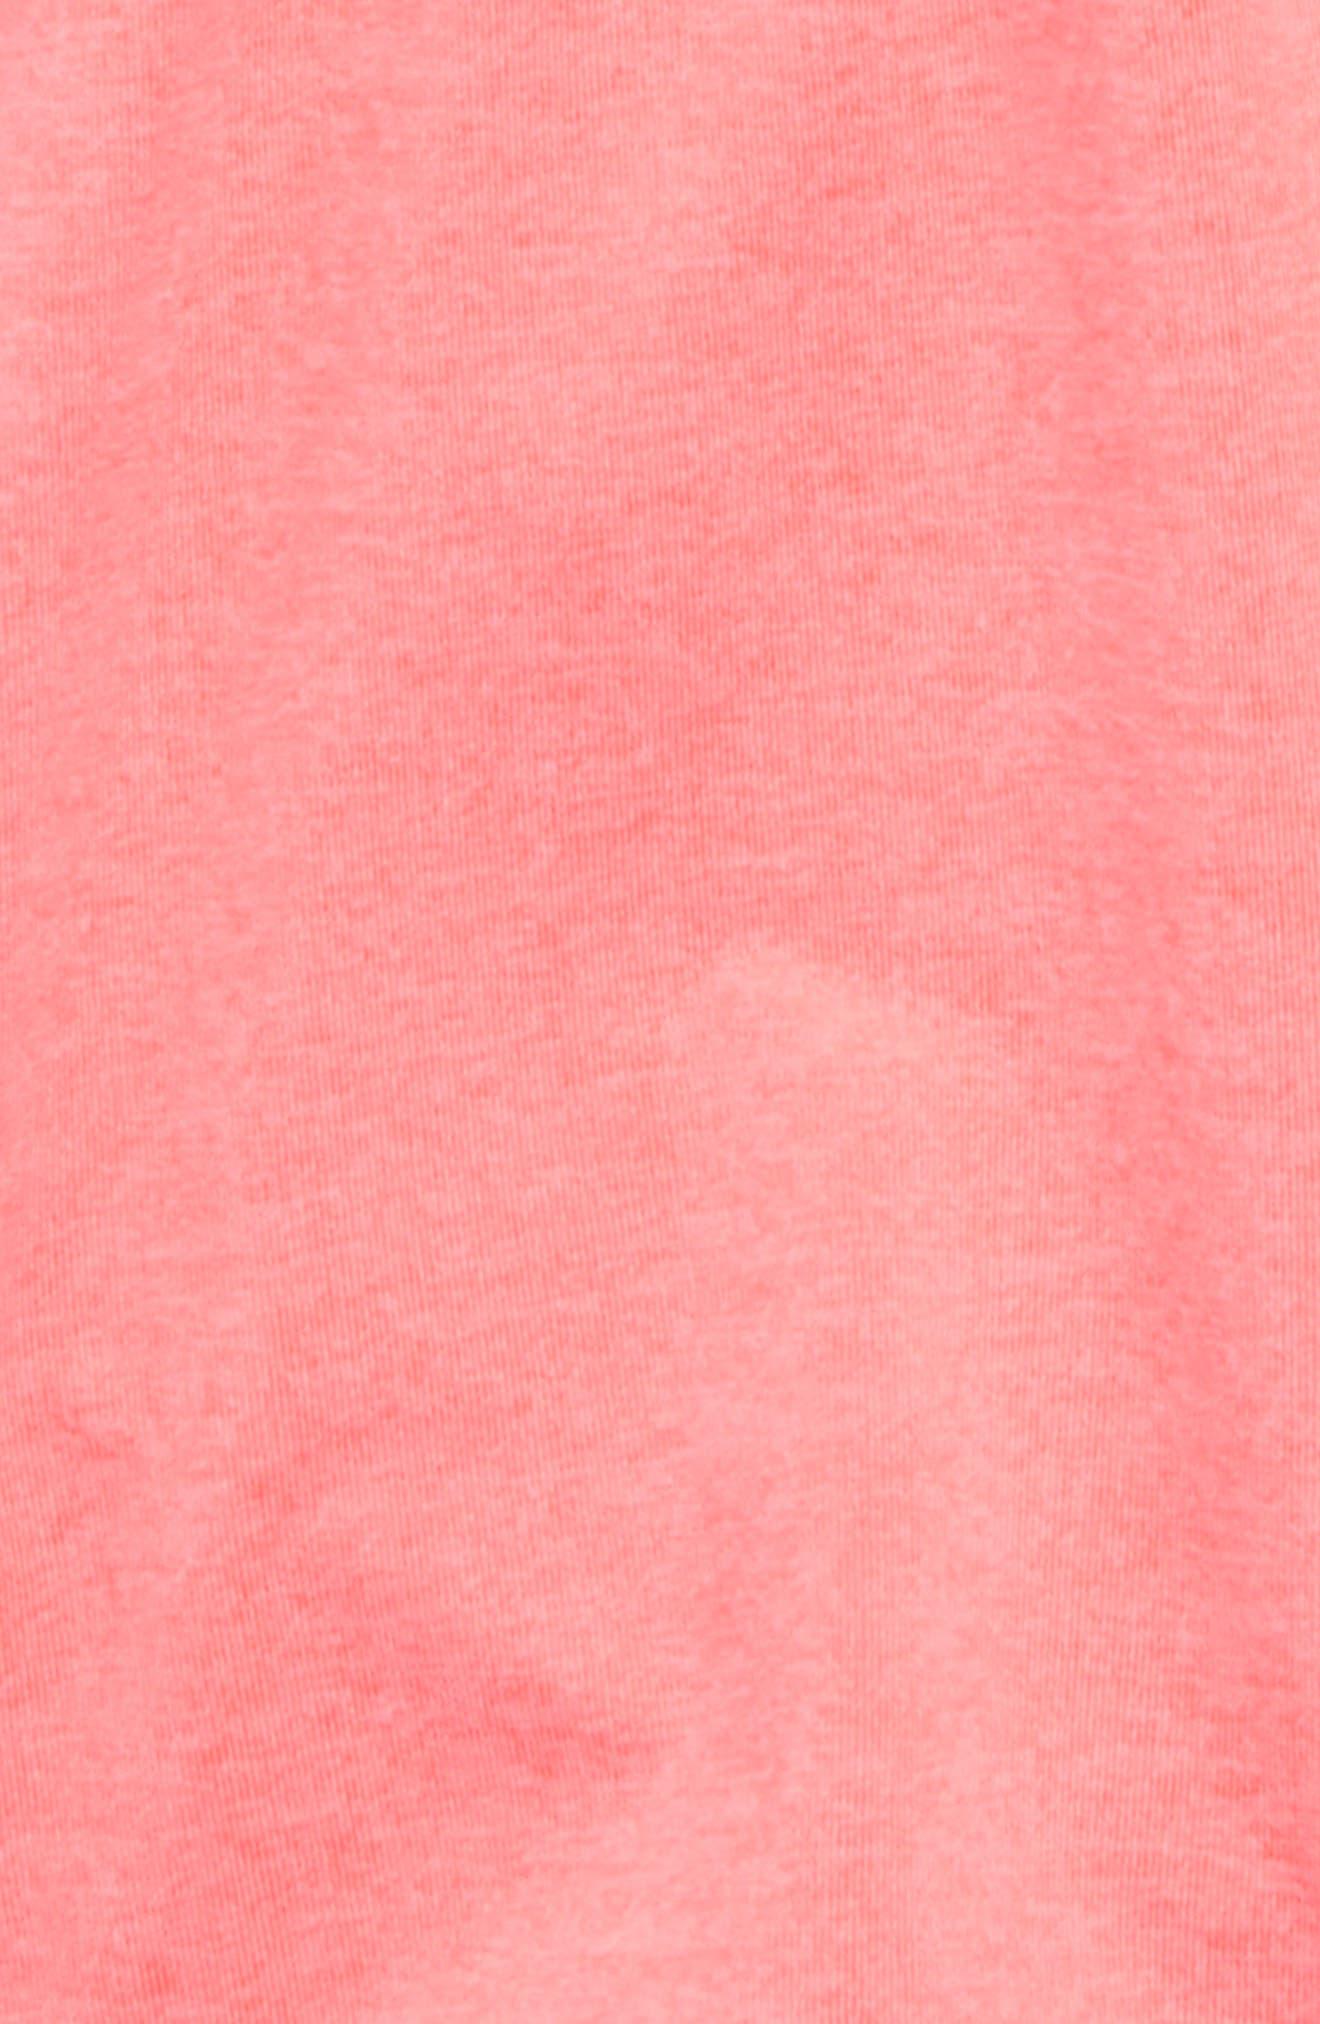 Logo Sport Shorts,                             Alternate thumbnail 2, color,                             Soft Flu Peach Heather